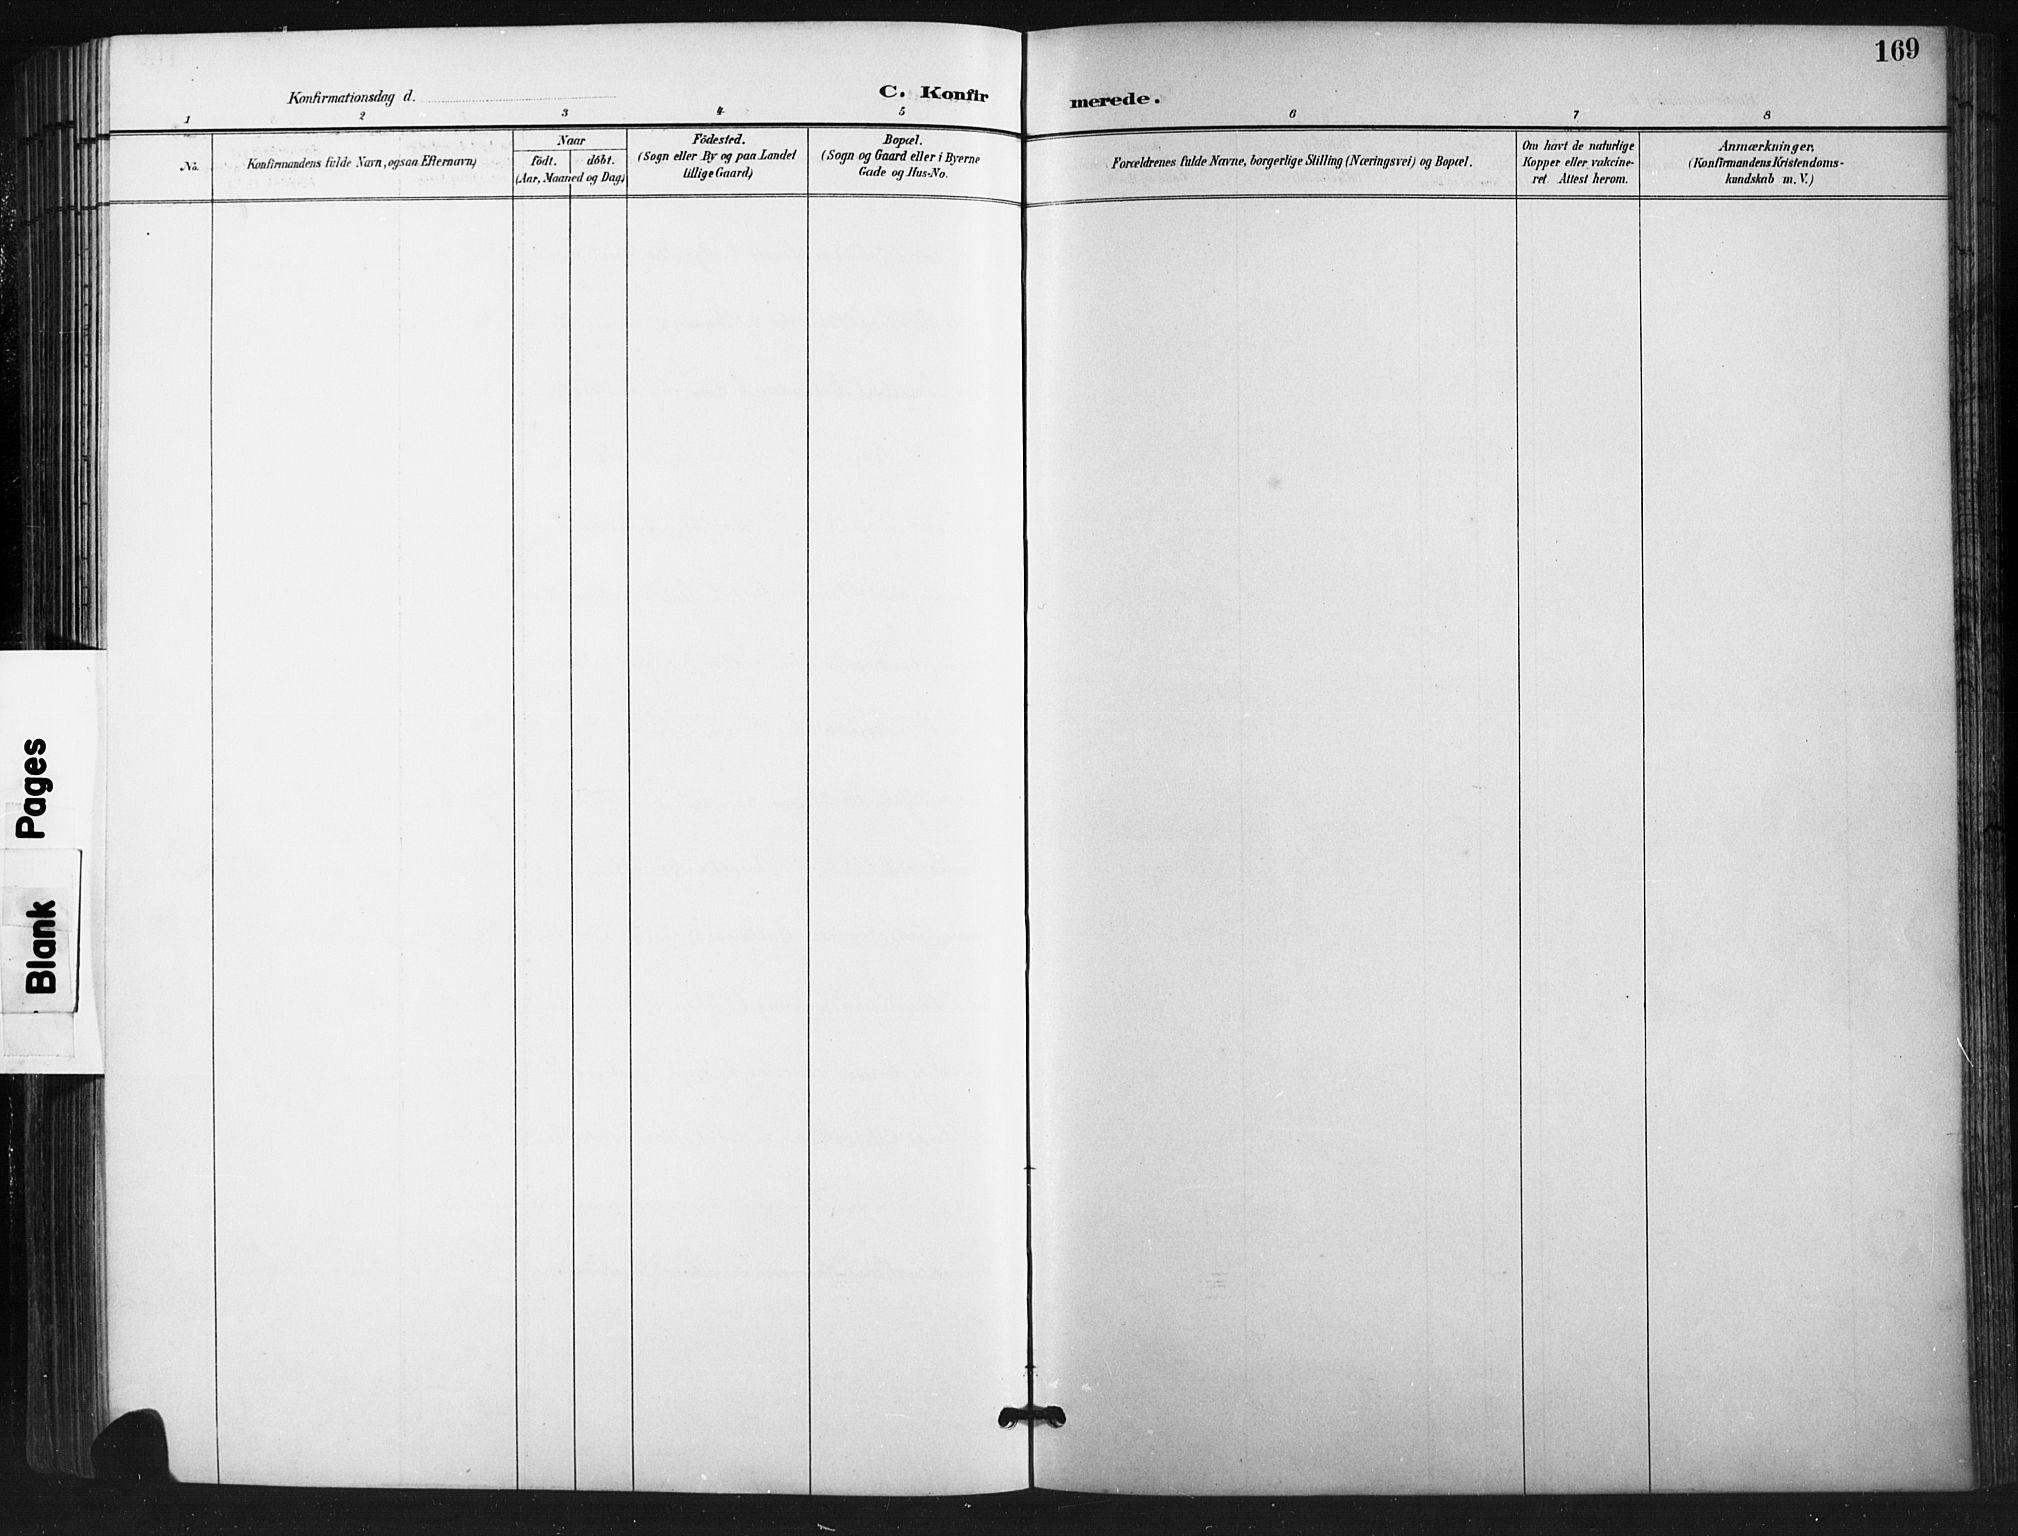 SAH, Vestre Gausdal prestekontor, Klokkerbok nr. 3, 1896-1925, s. 169